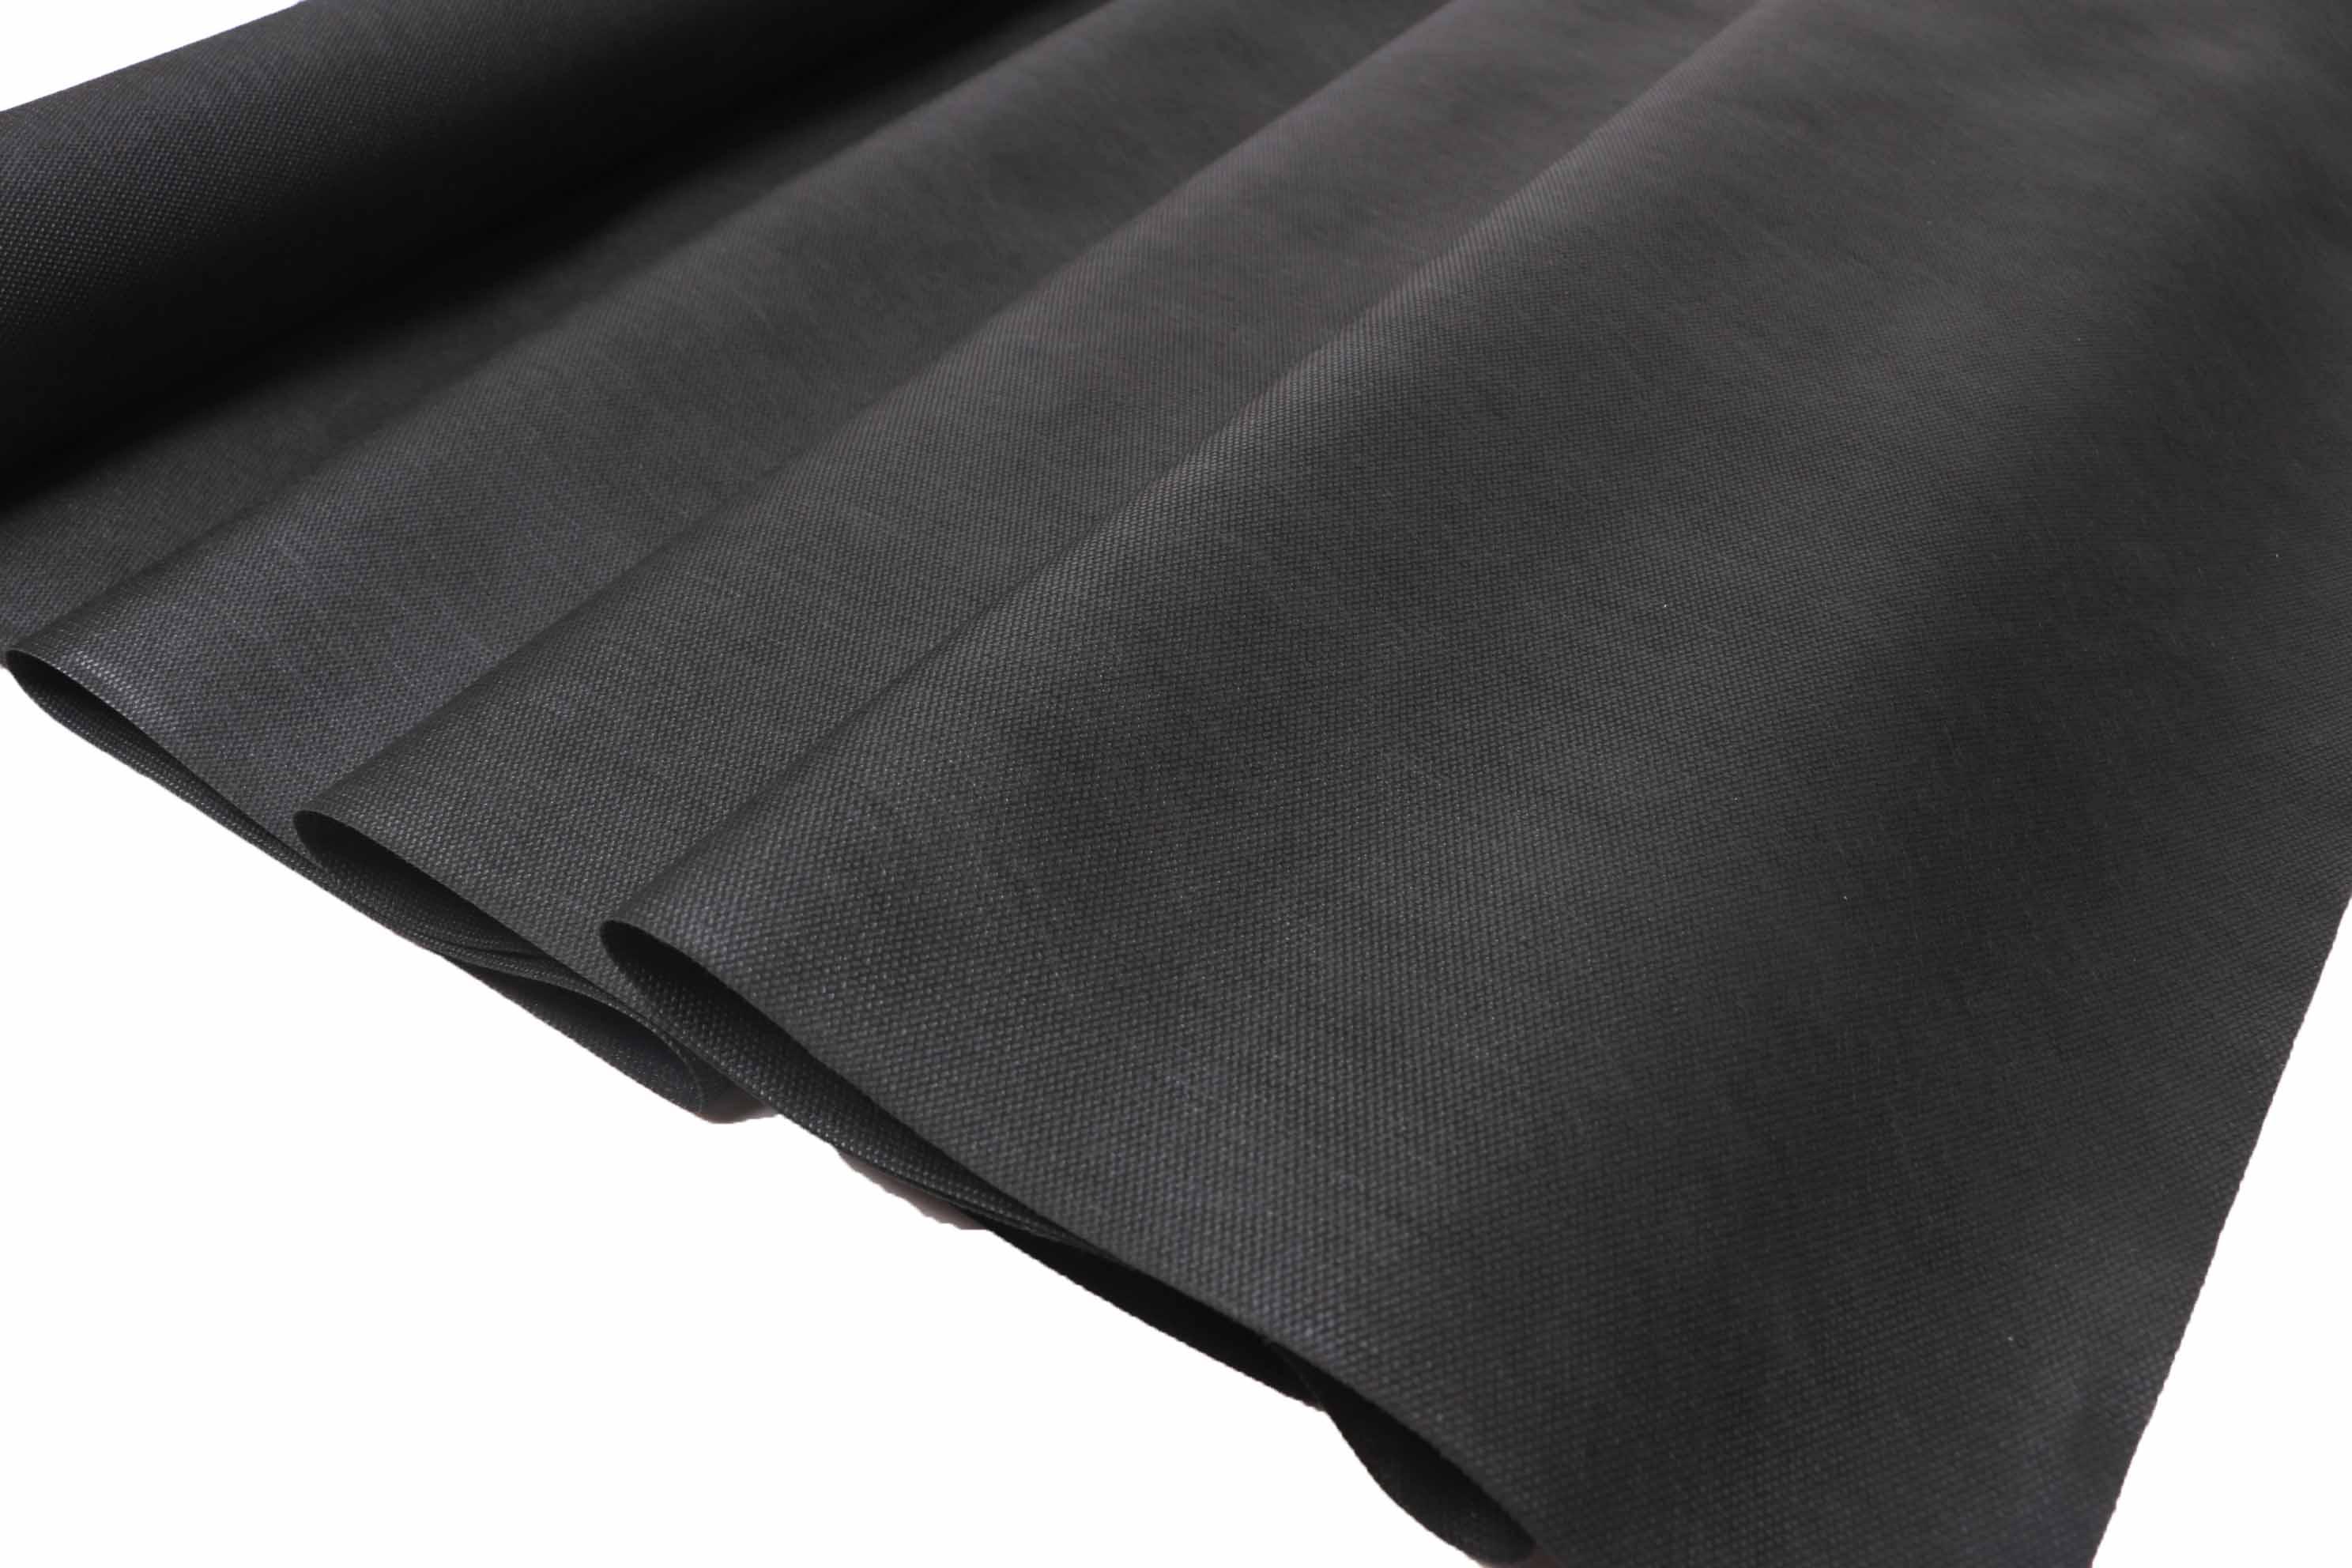 Black weed control fabric